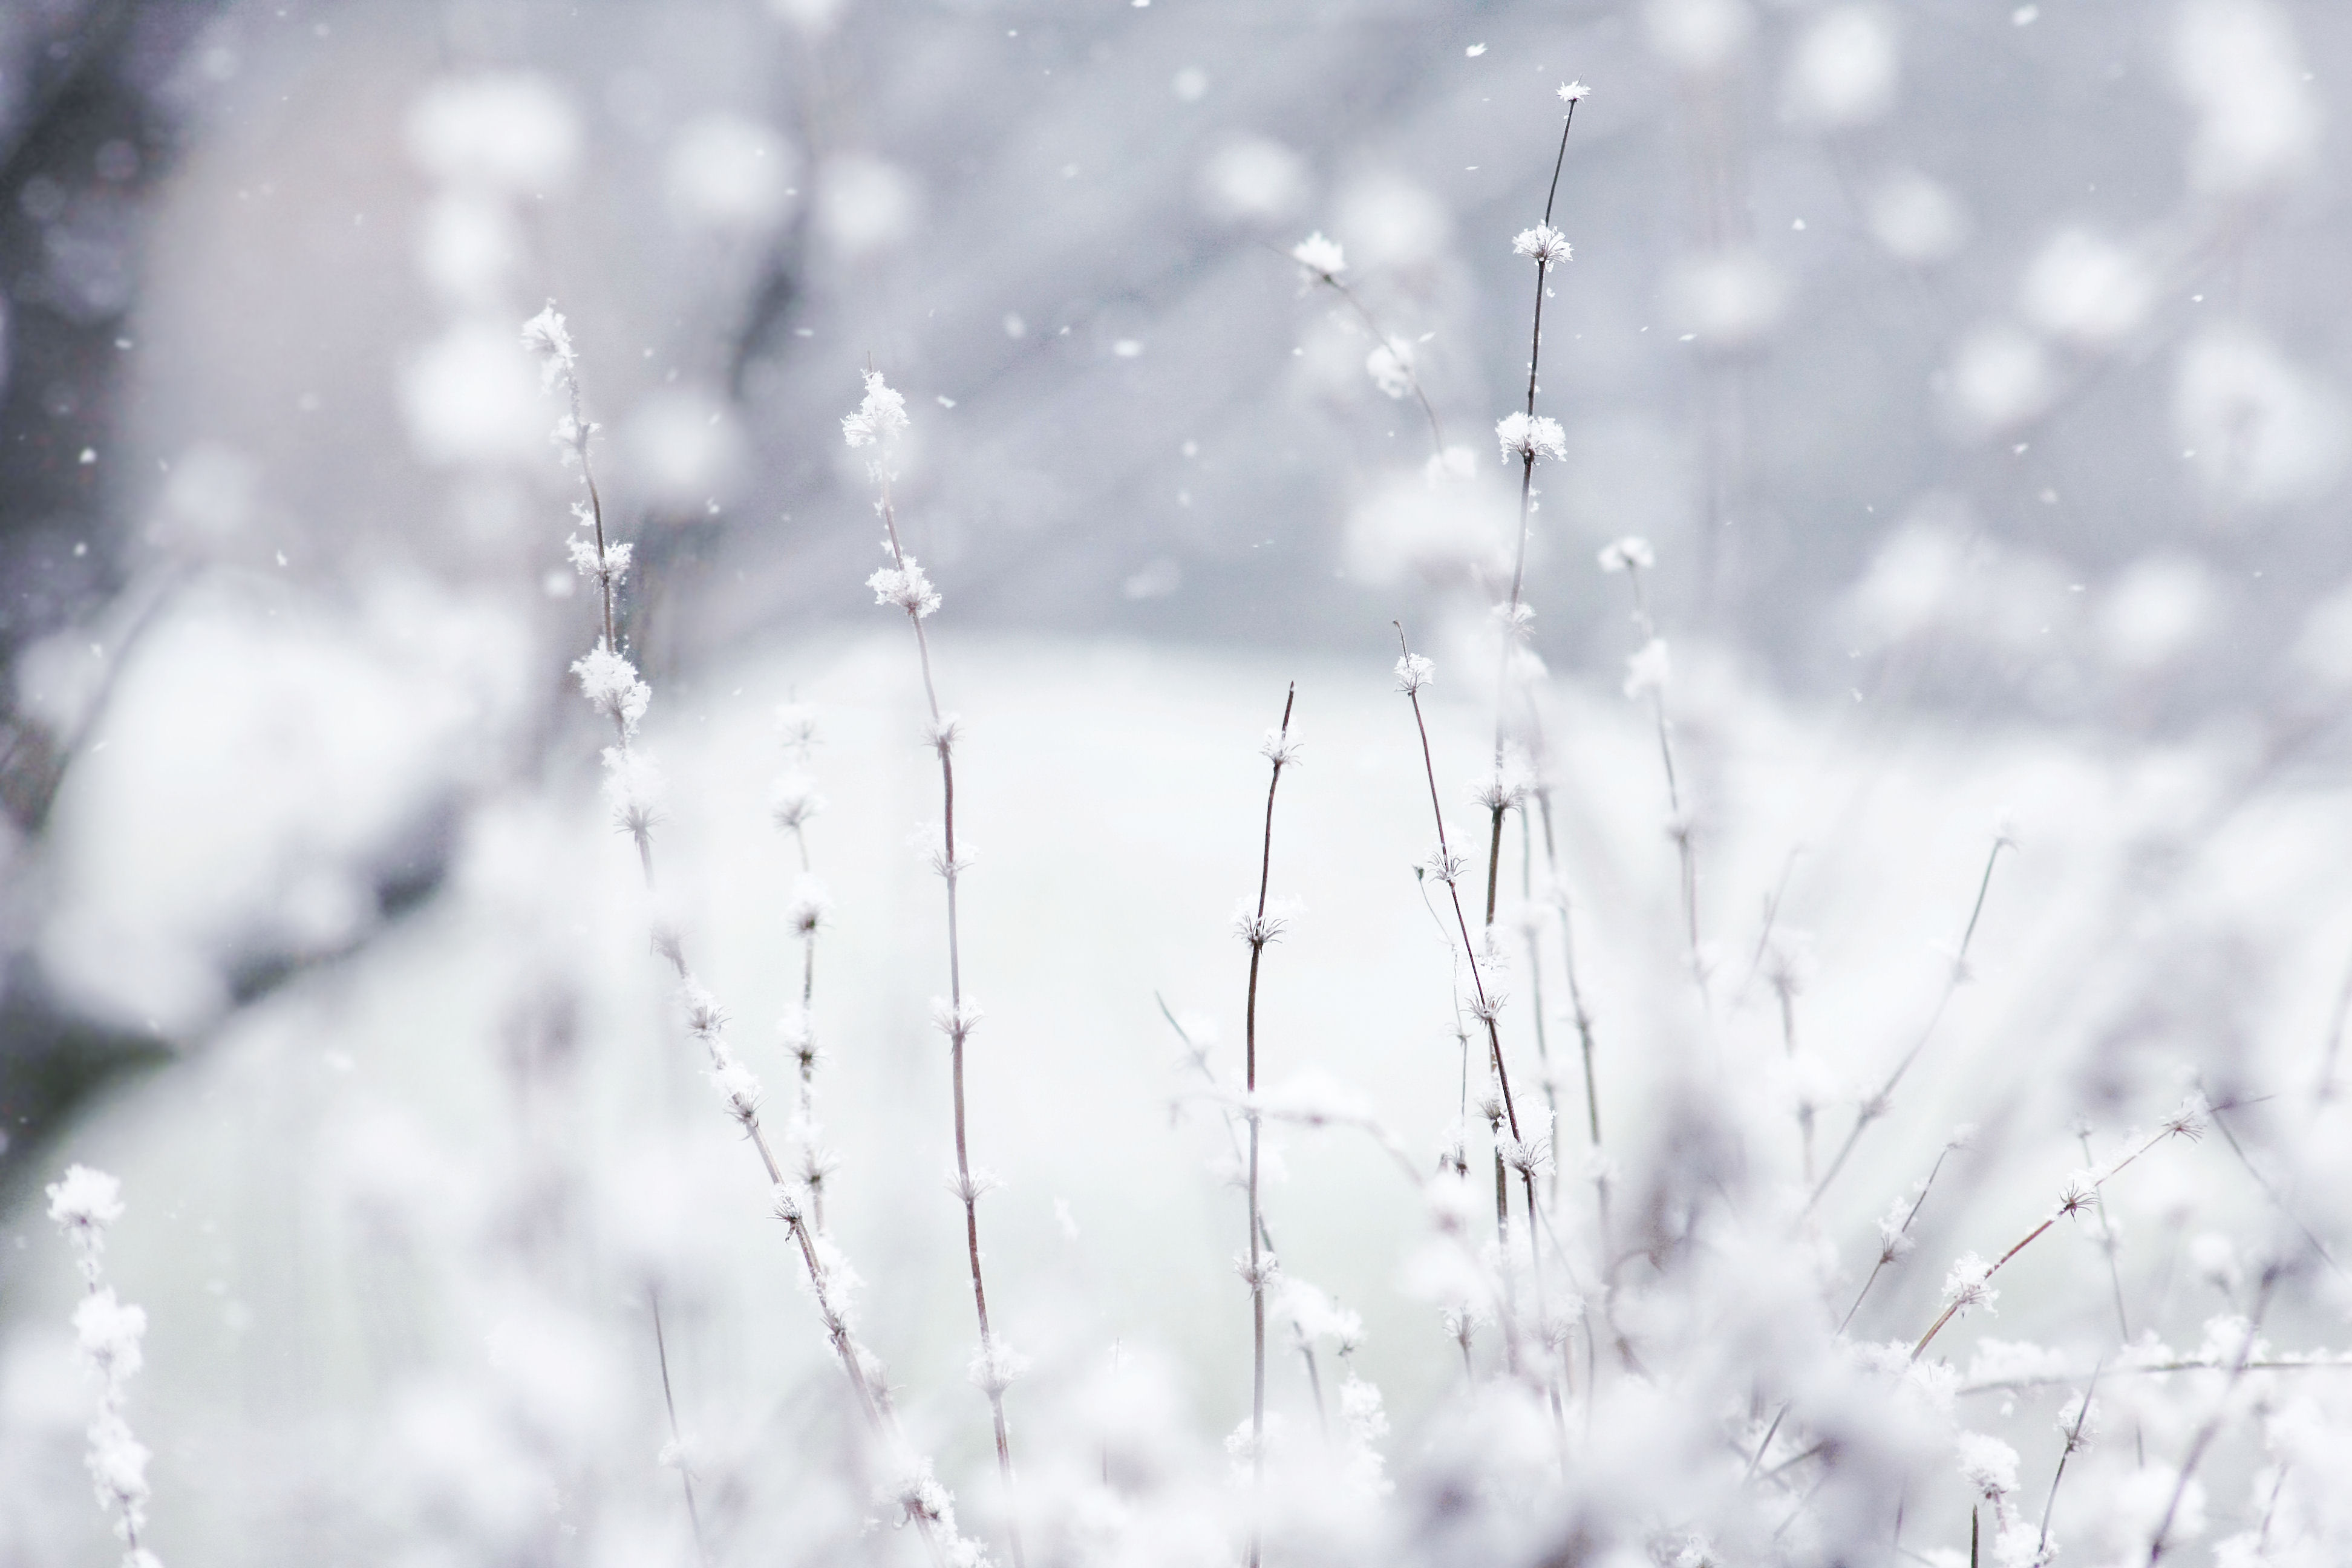 Android Wallpaper Winter Wonderland 3888x2592